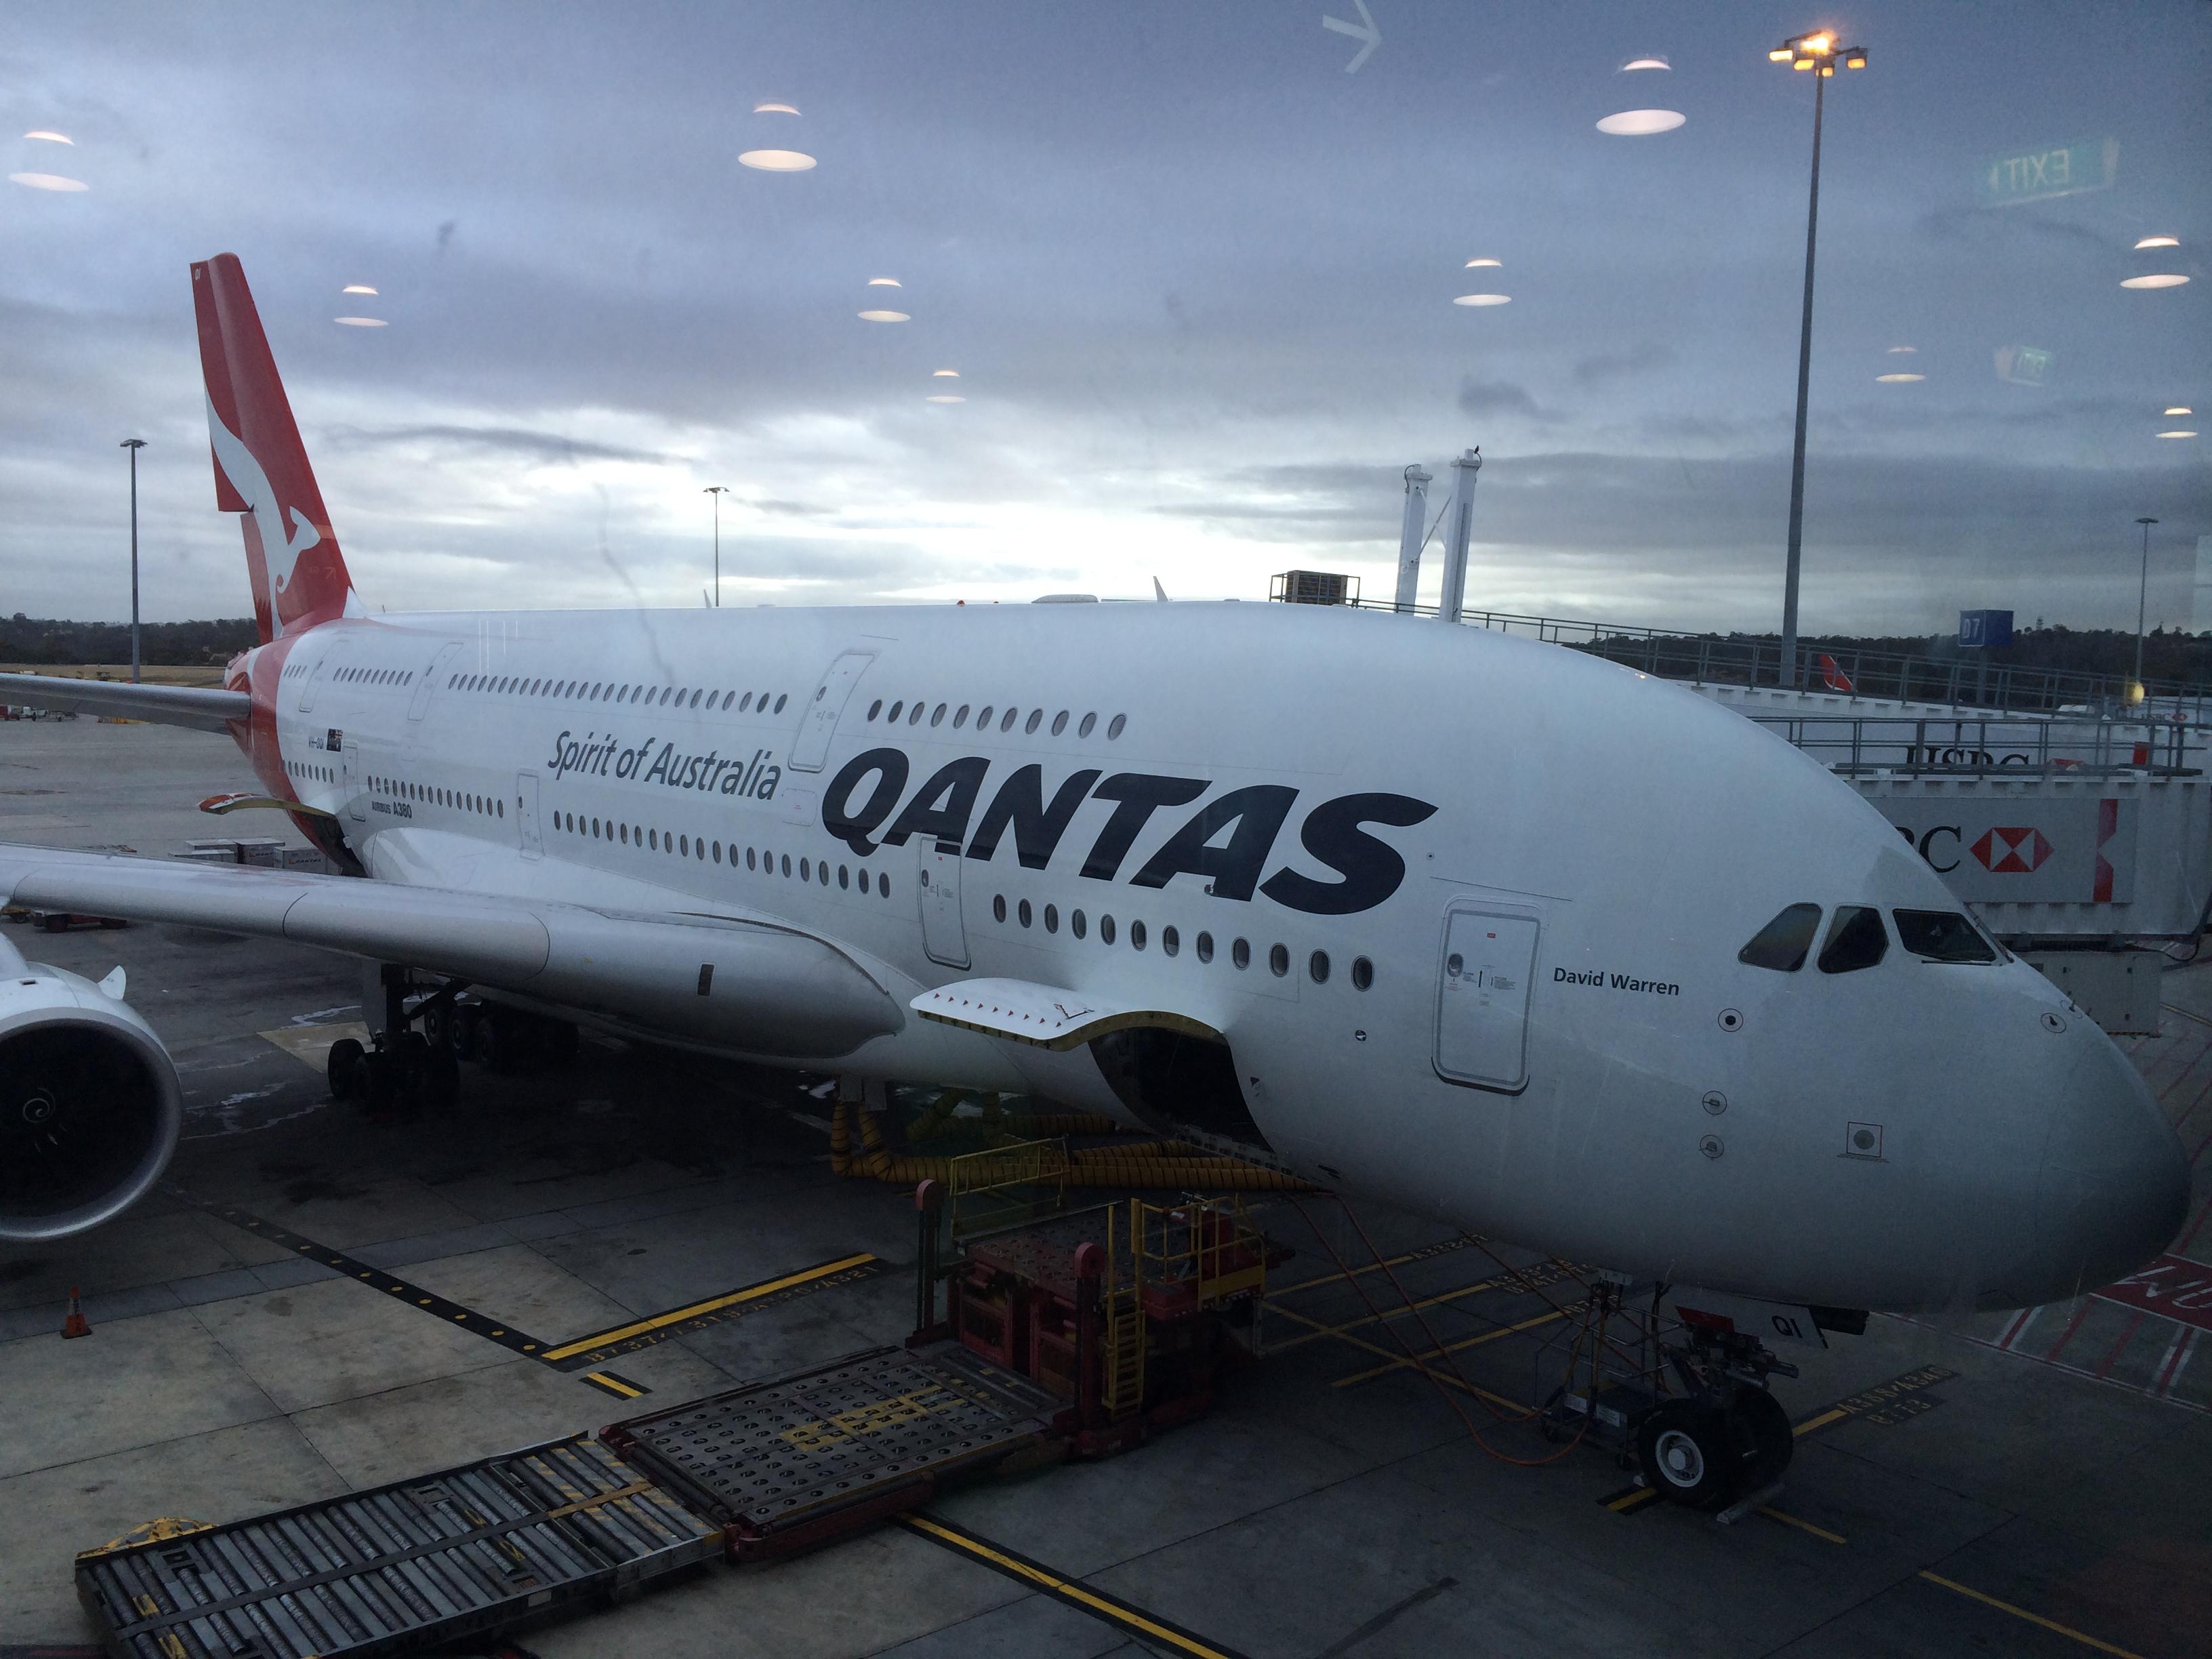 zzi mondaymorning 24 march 2014 our qantas flight 93. Black Bedroom Furniture Sets. Home Design Ideas